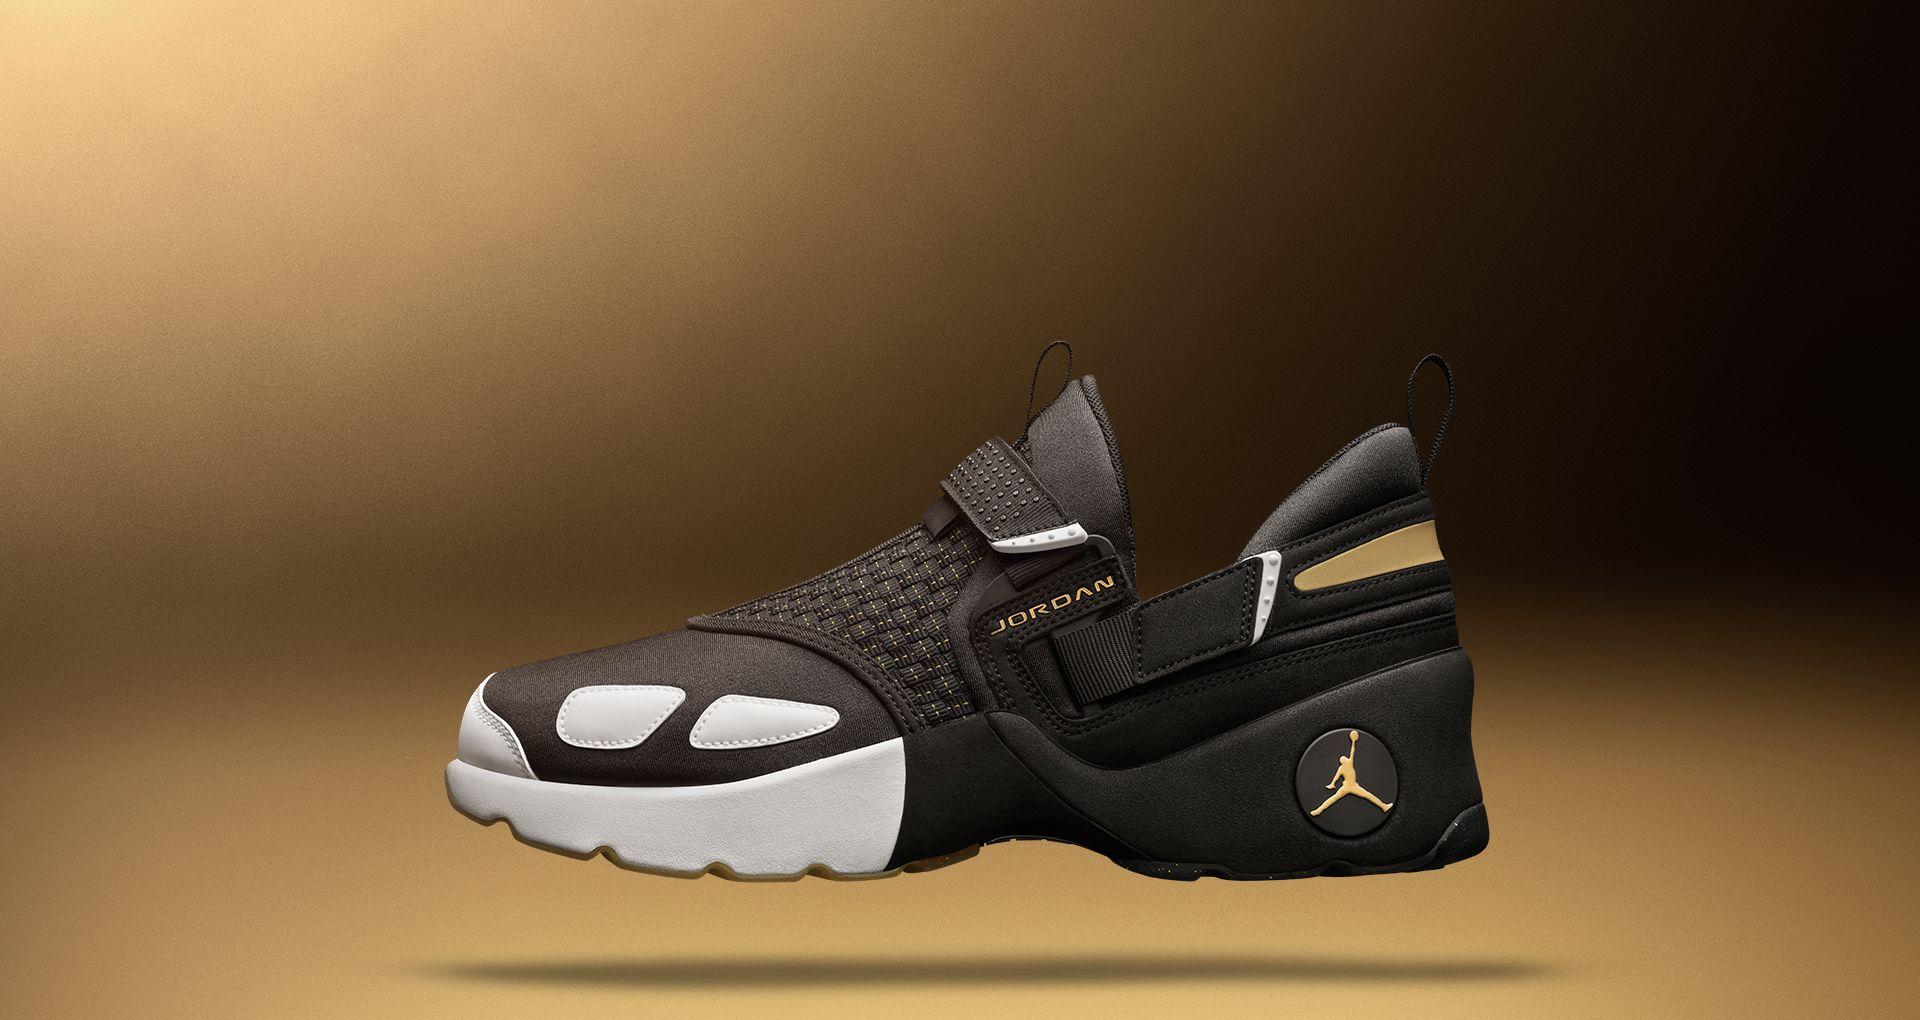 Jordan Trunner LX  BHM  2017. Nike+ Launch AT b52410a14232